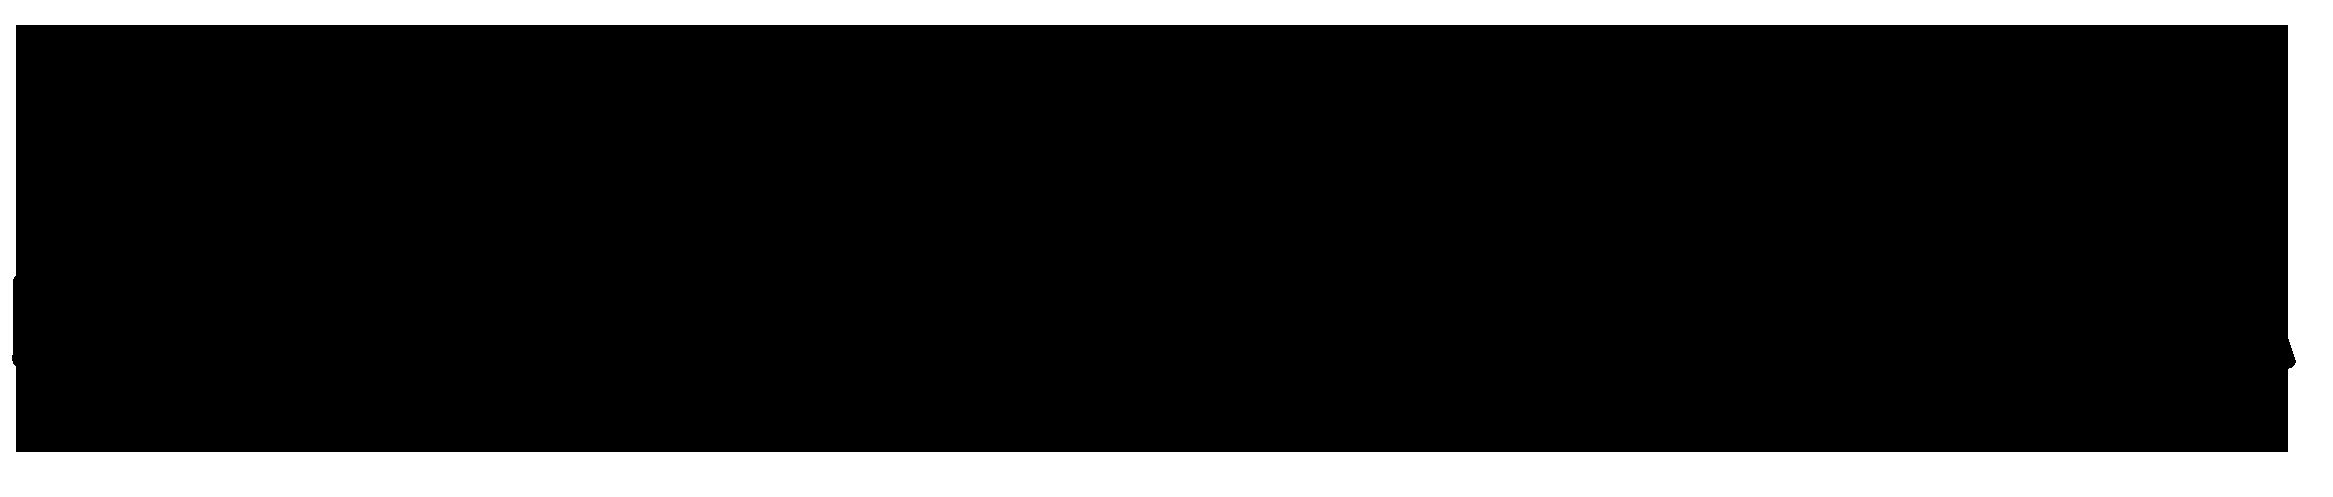 Selin Çanta